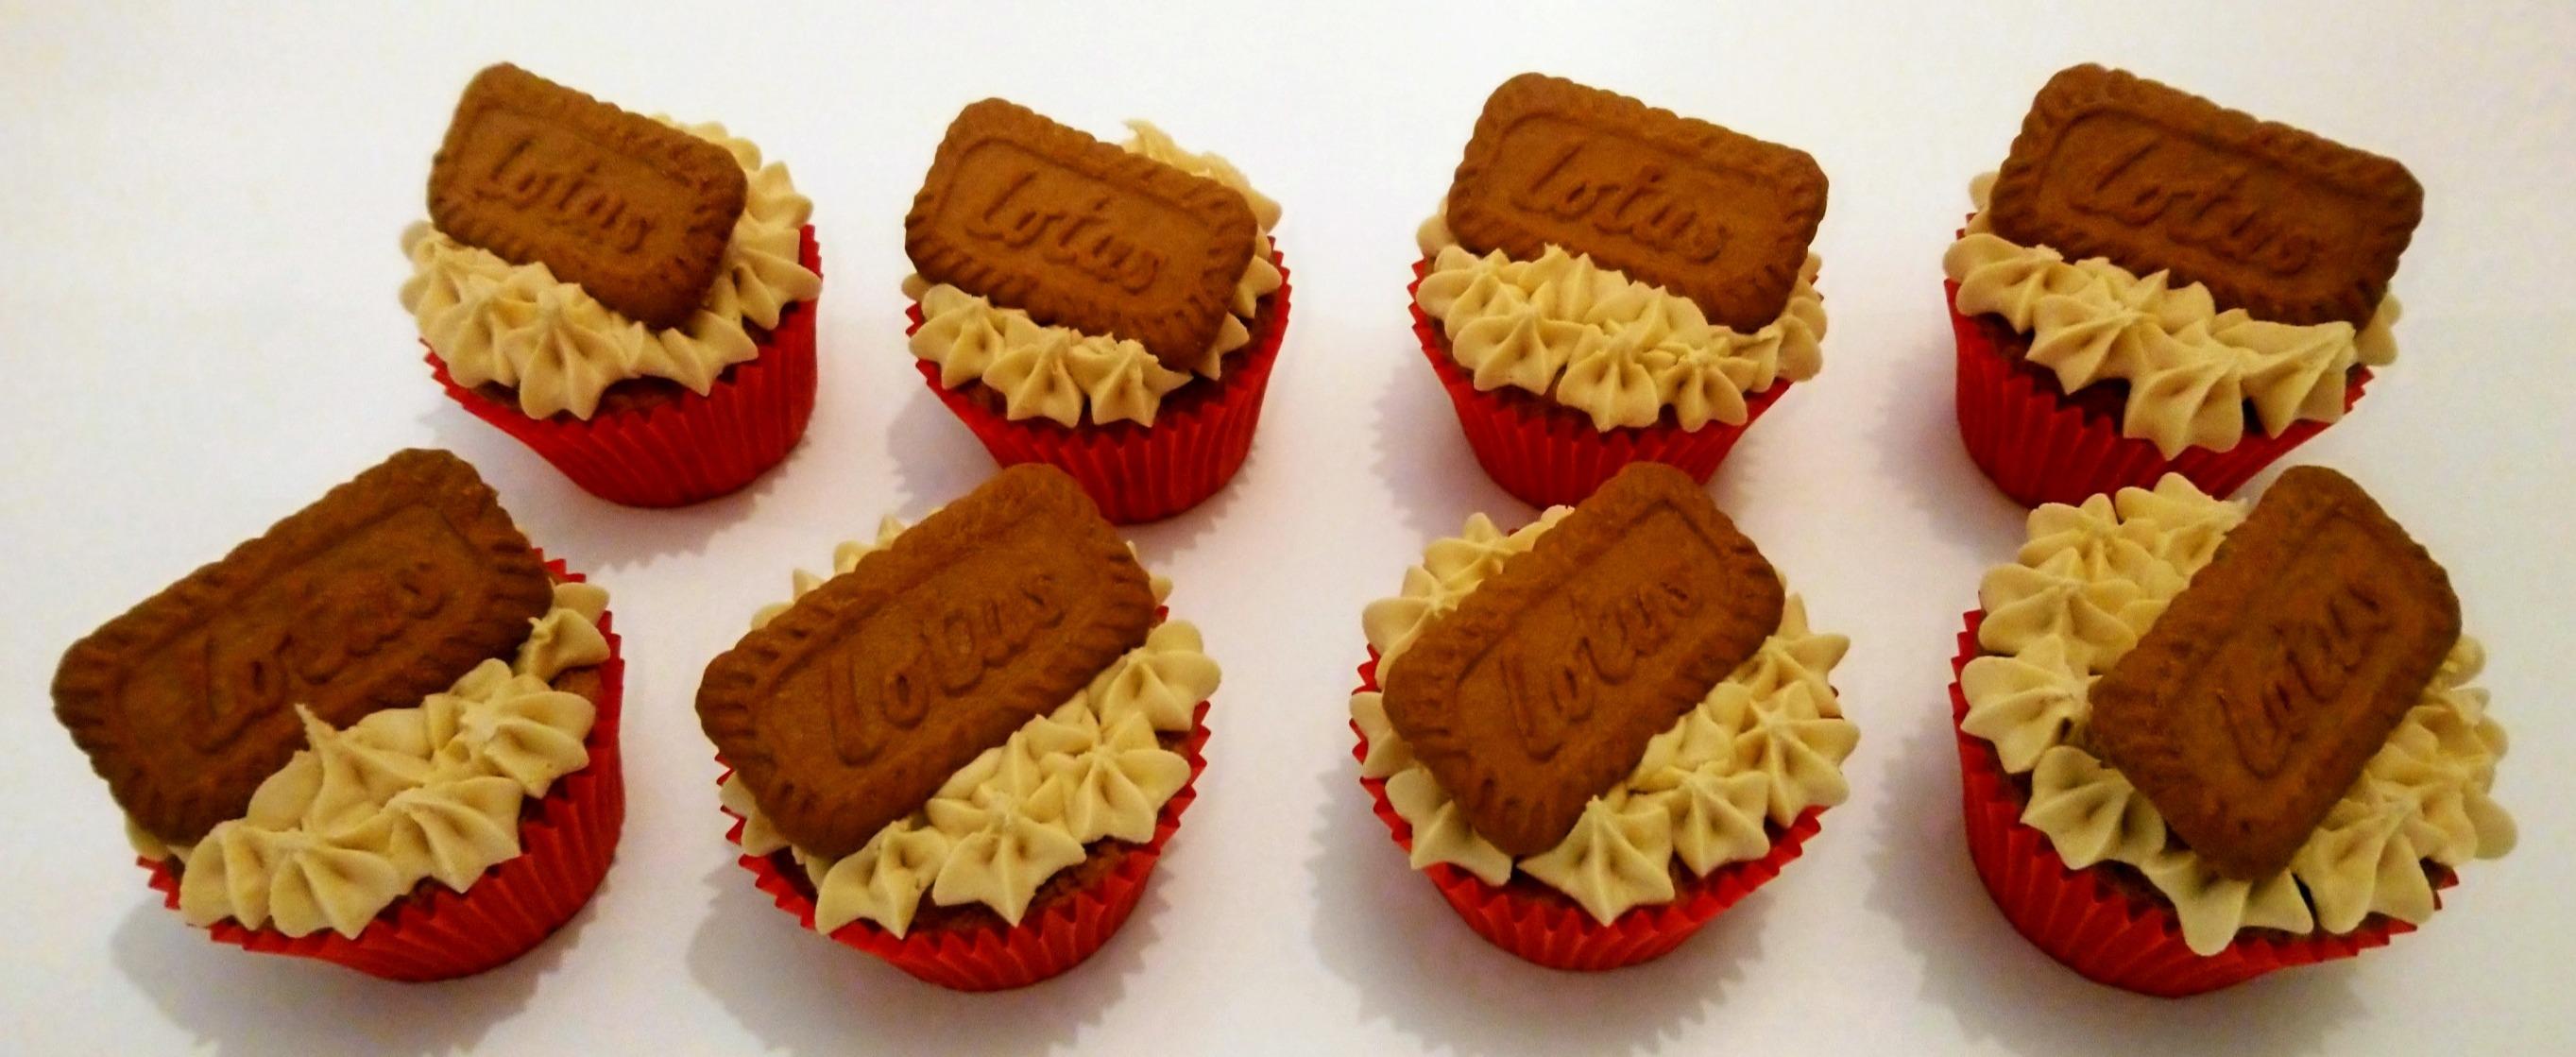 Lotus Biscoff Cupcakes